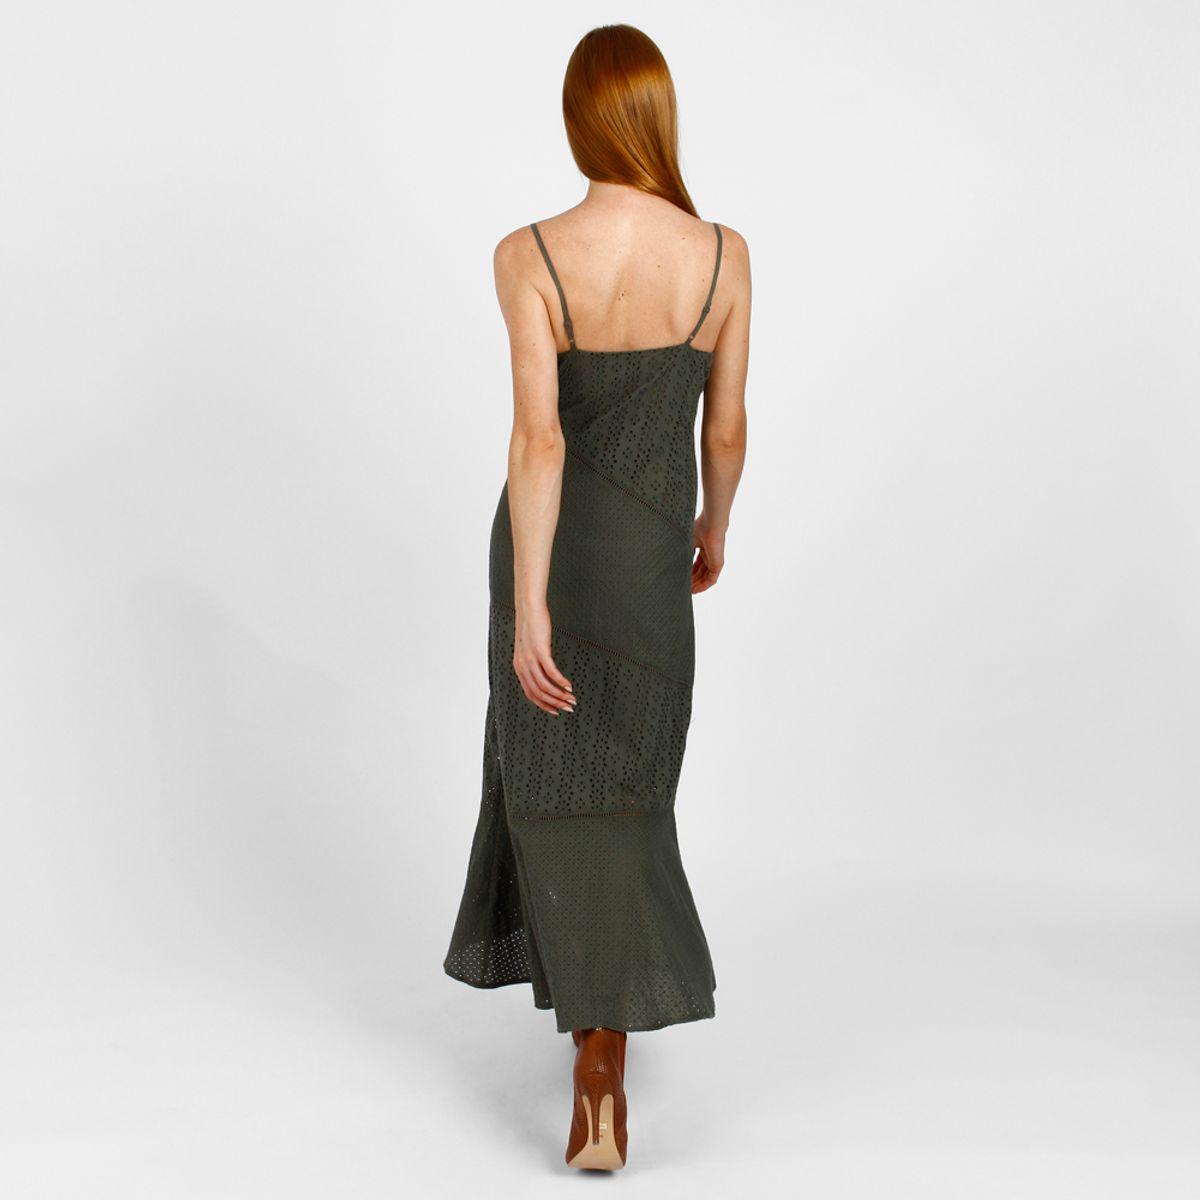 Vestido-Liso-Plano---36